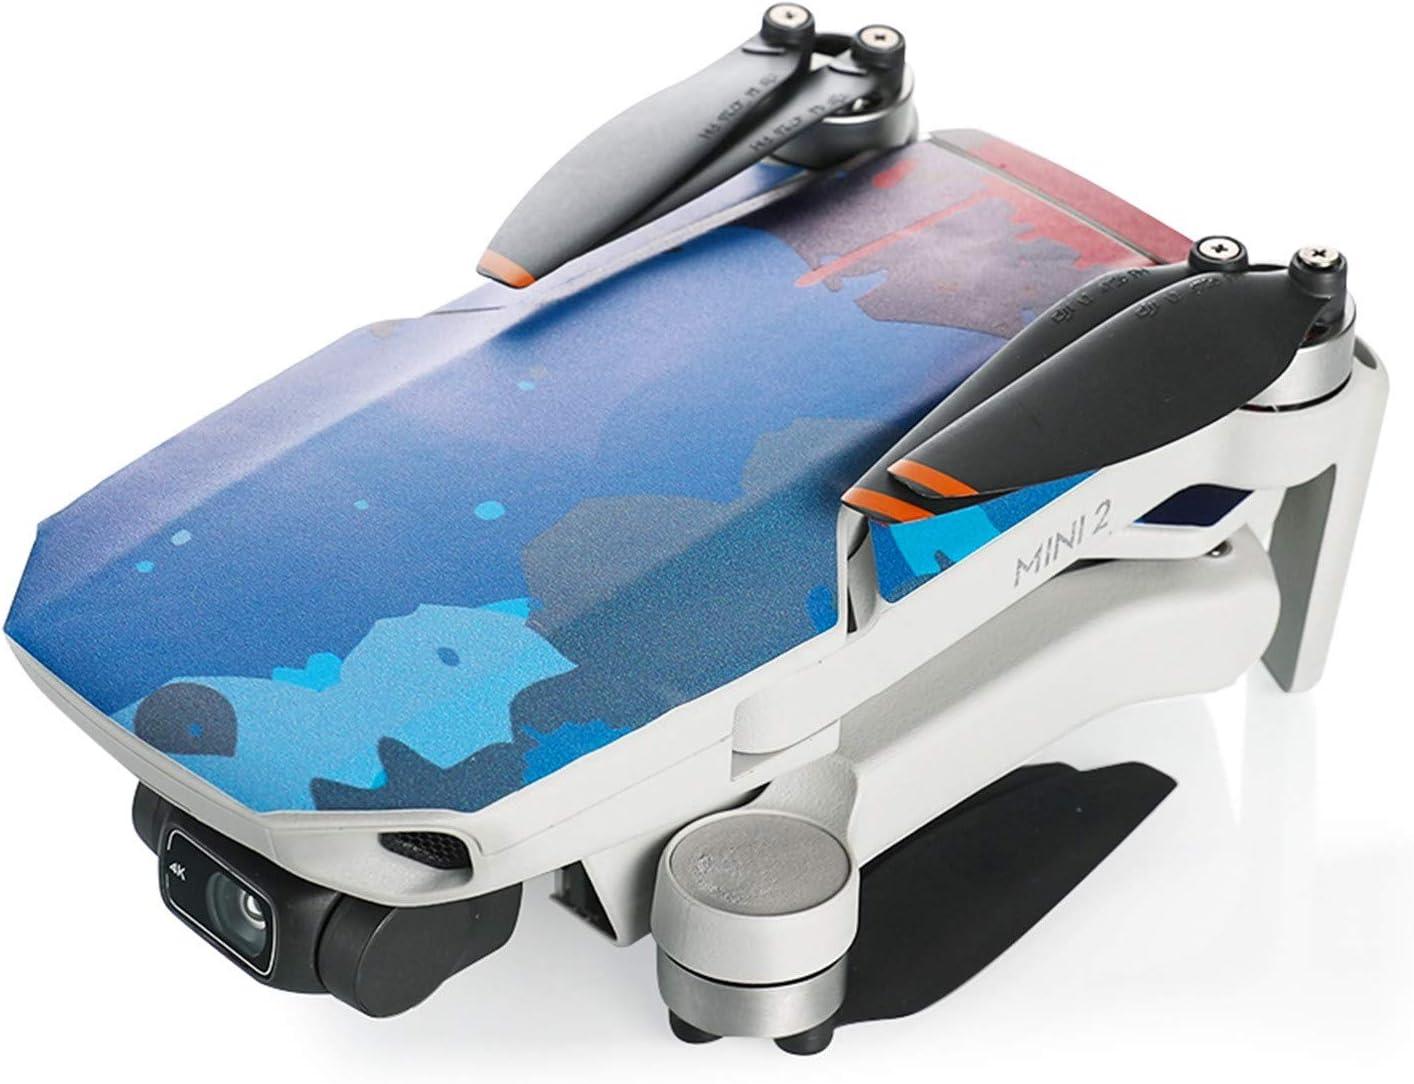 Mavic Mini 2 Skin Stickers,Waterproof PVC Stickers fofr Mavic Mini 2,DIY Decal Skin Cover Protector for DJI Mavic Mini 2 Drone Body /& Controller Accessory